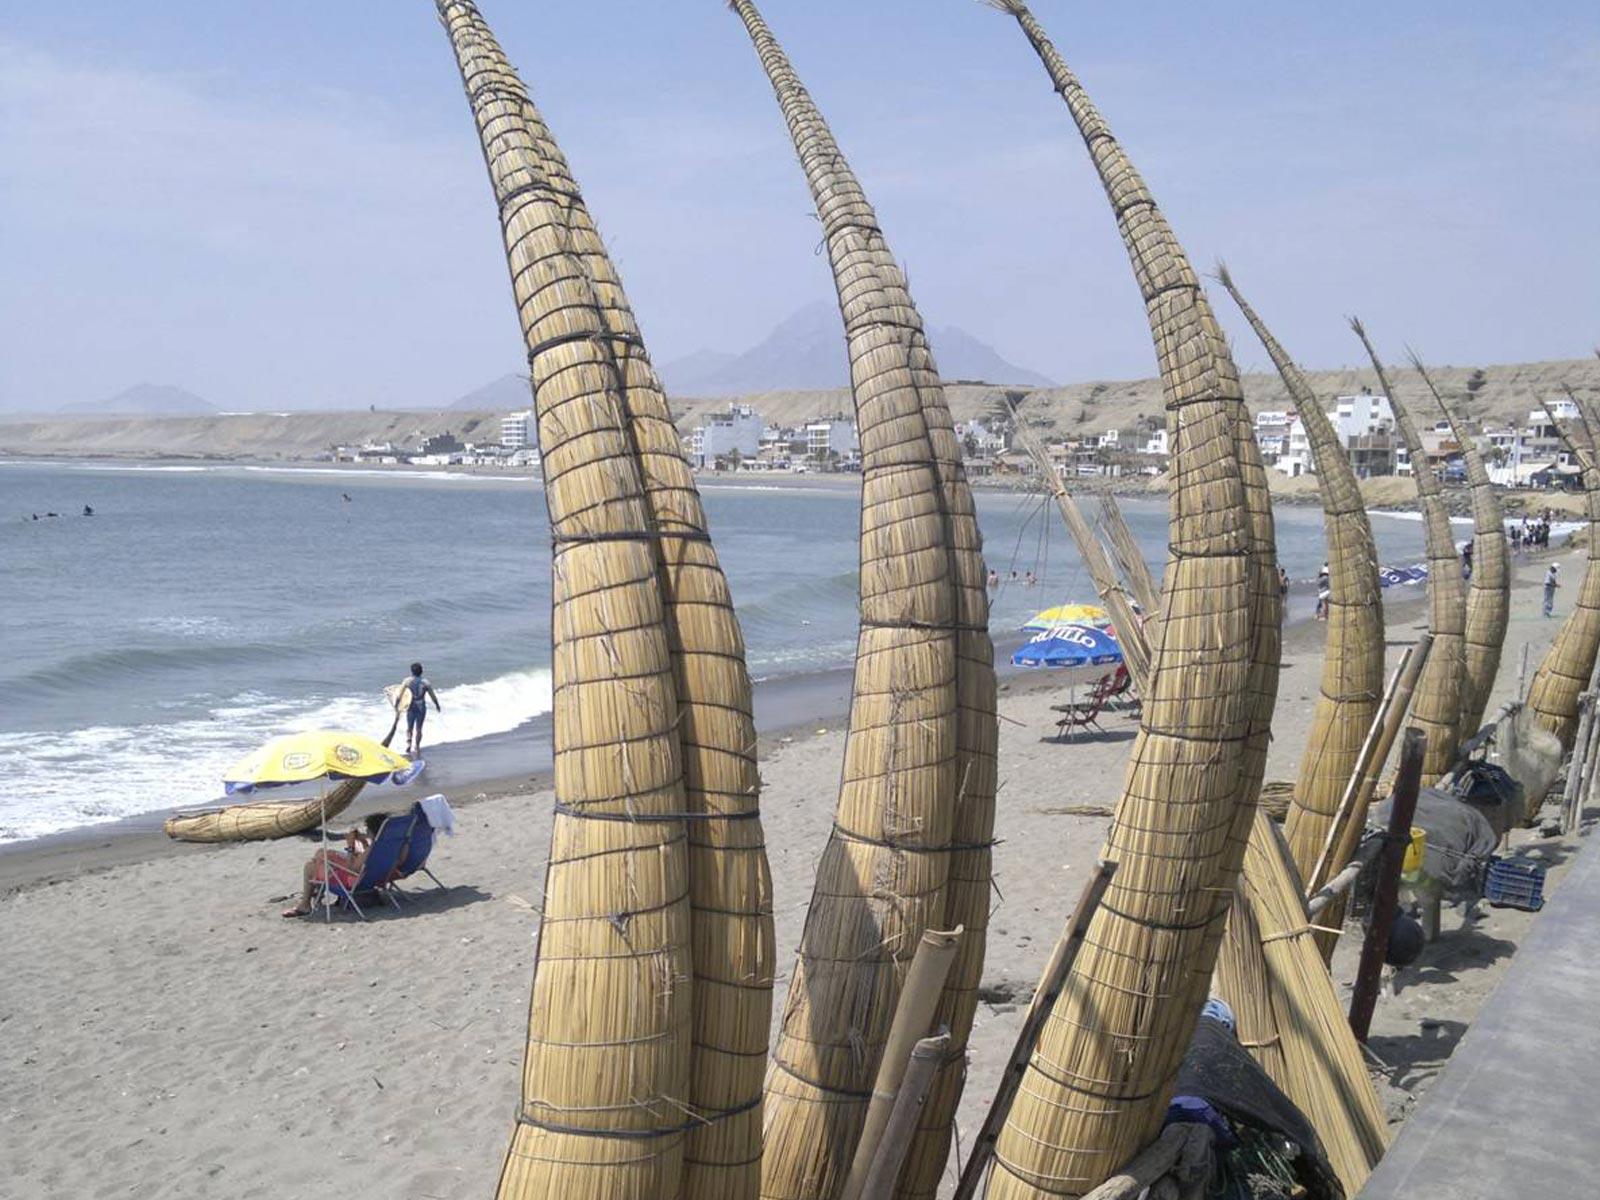 Peru-huanchaco-playa-lamella-tradizionali-pescatori-fishermen